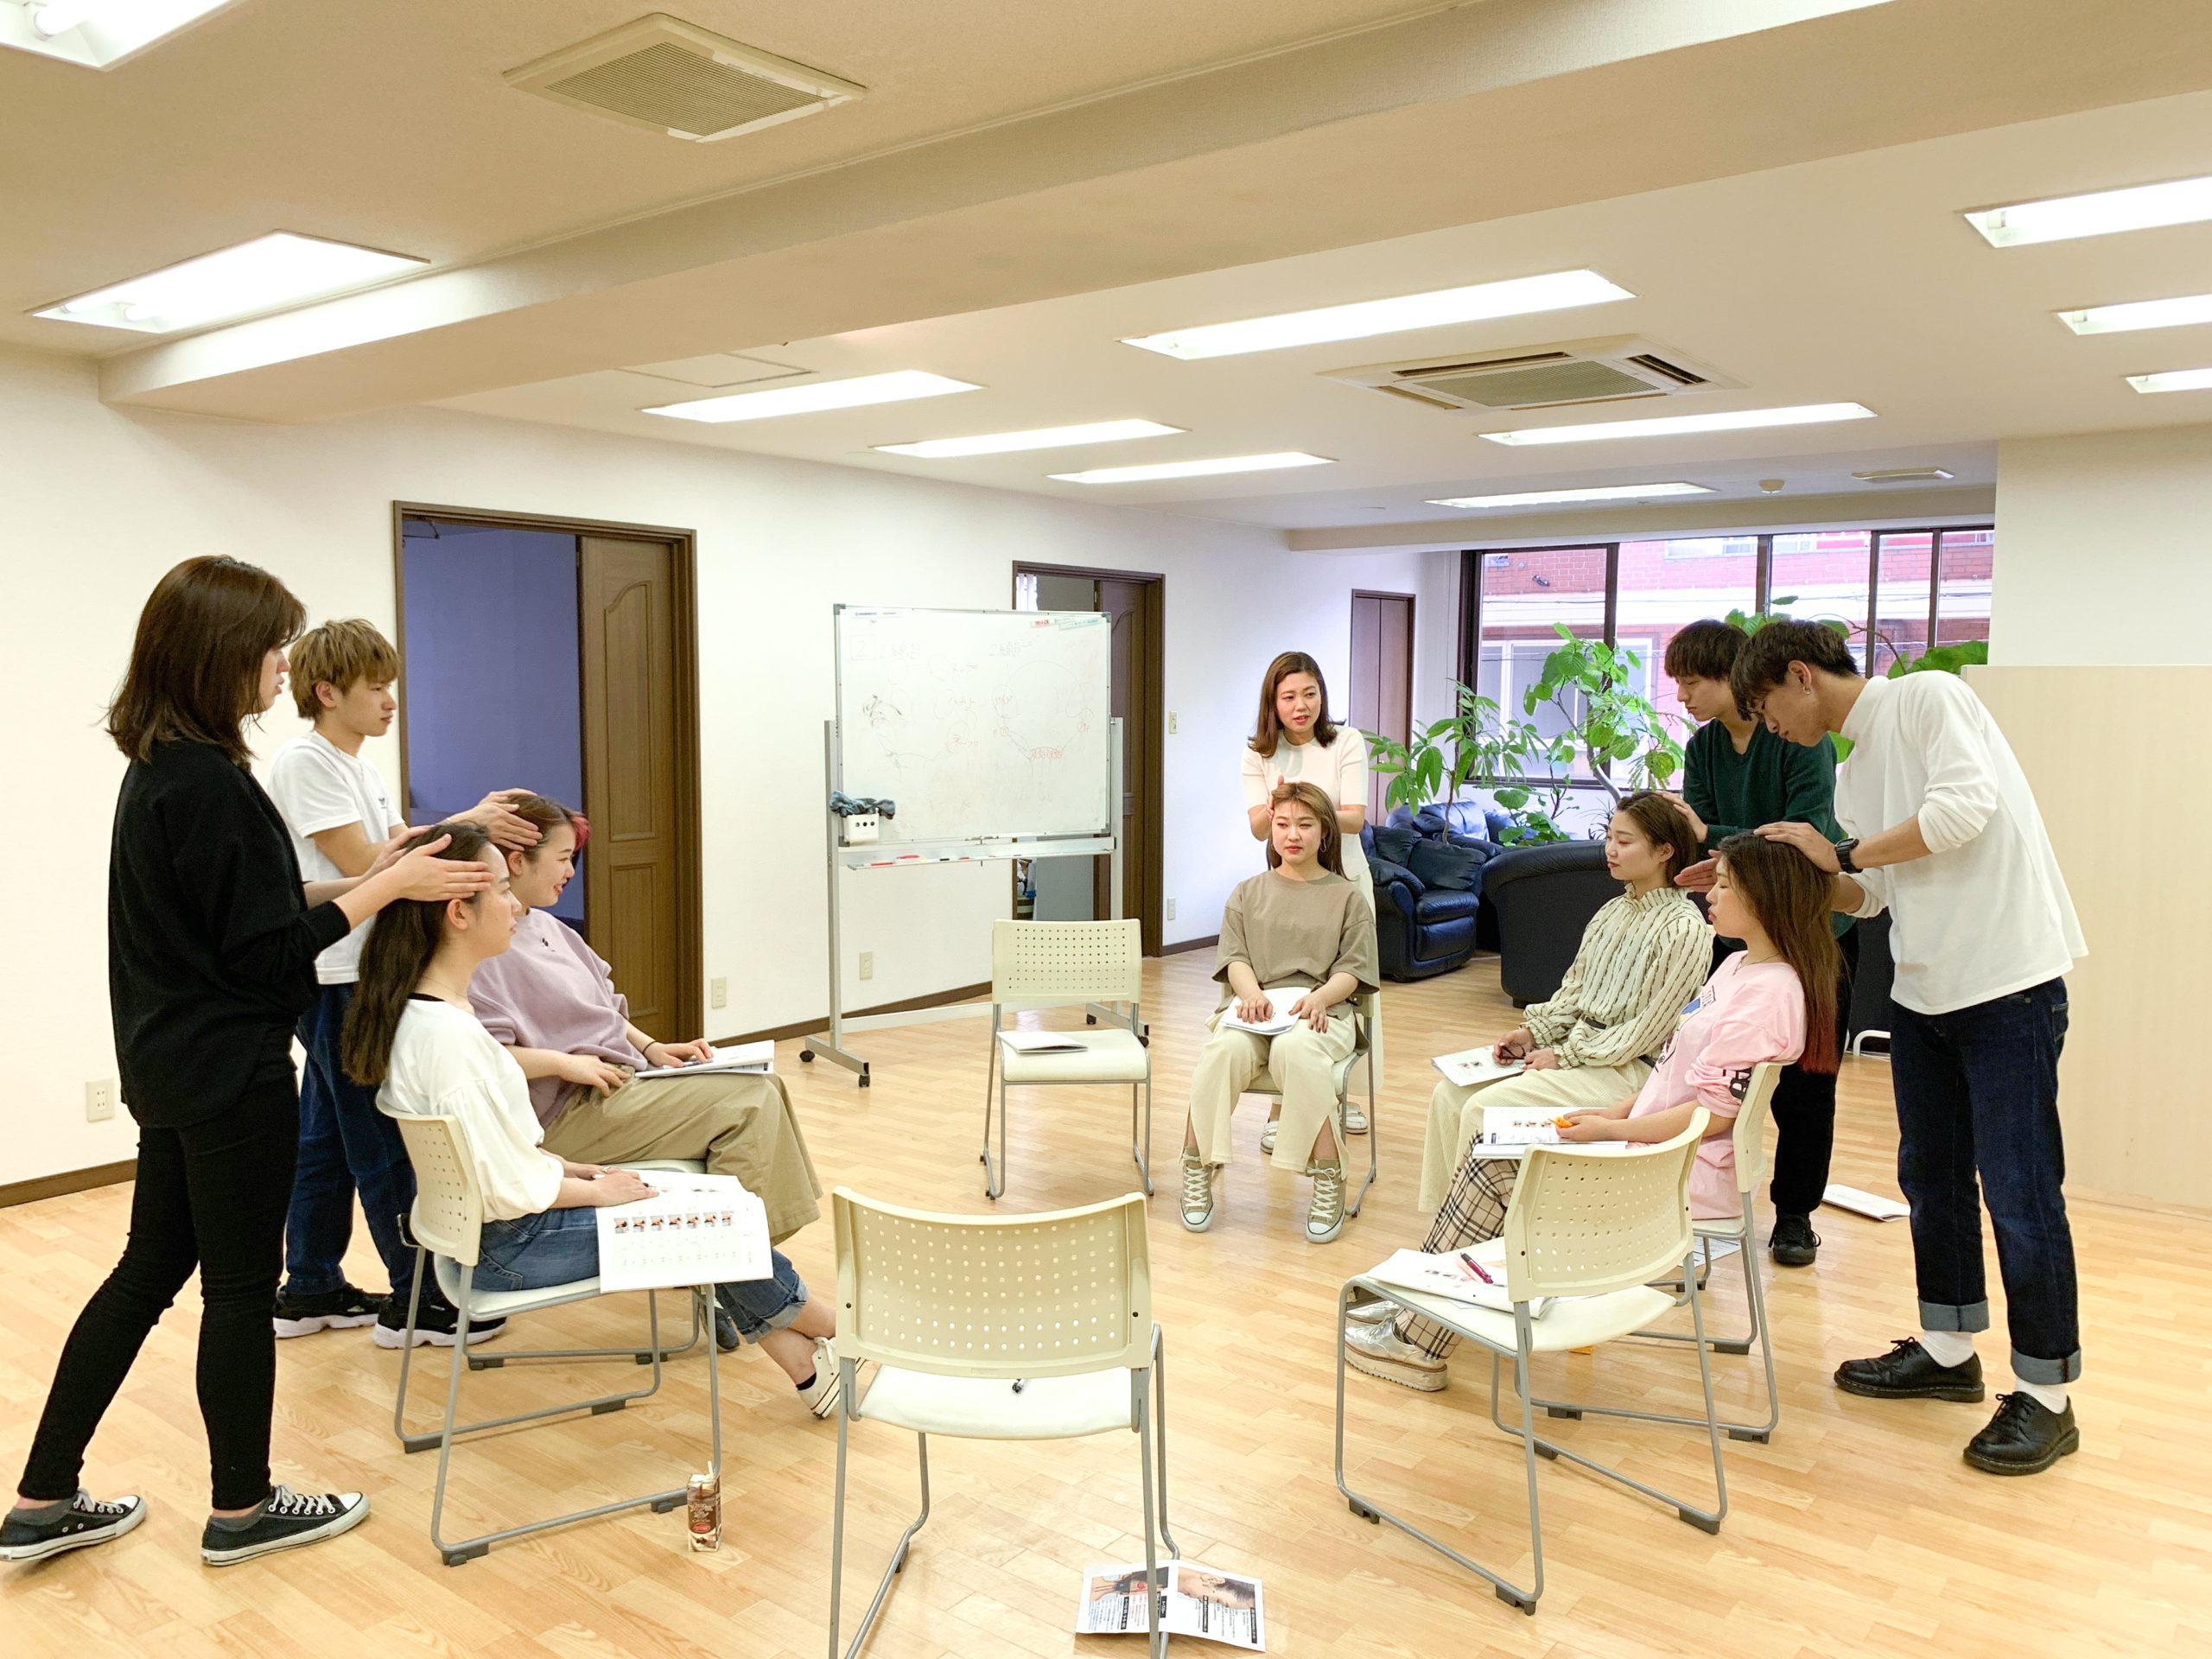 Snipの美容師の離職率が低い理由の一つ、営業中にレッスンのできるアカデミー